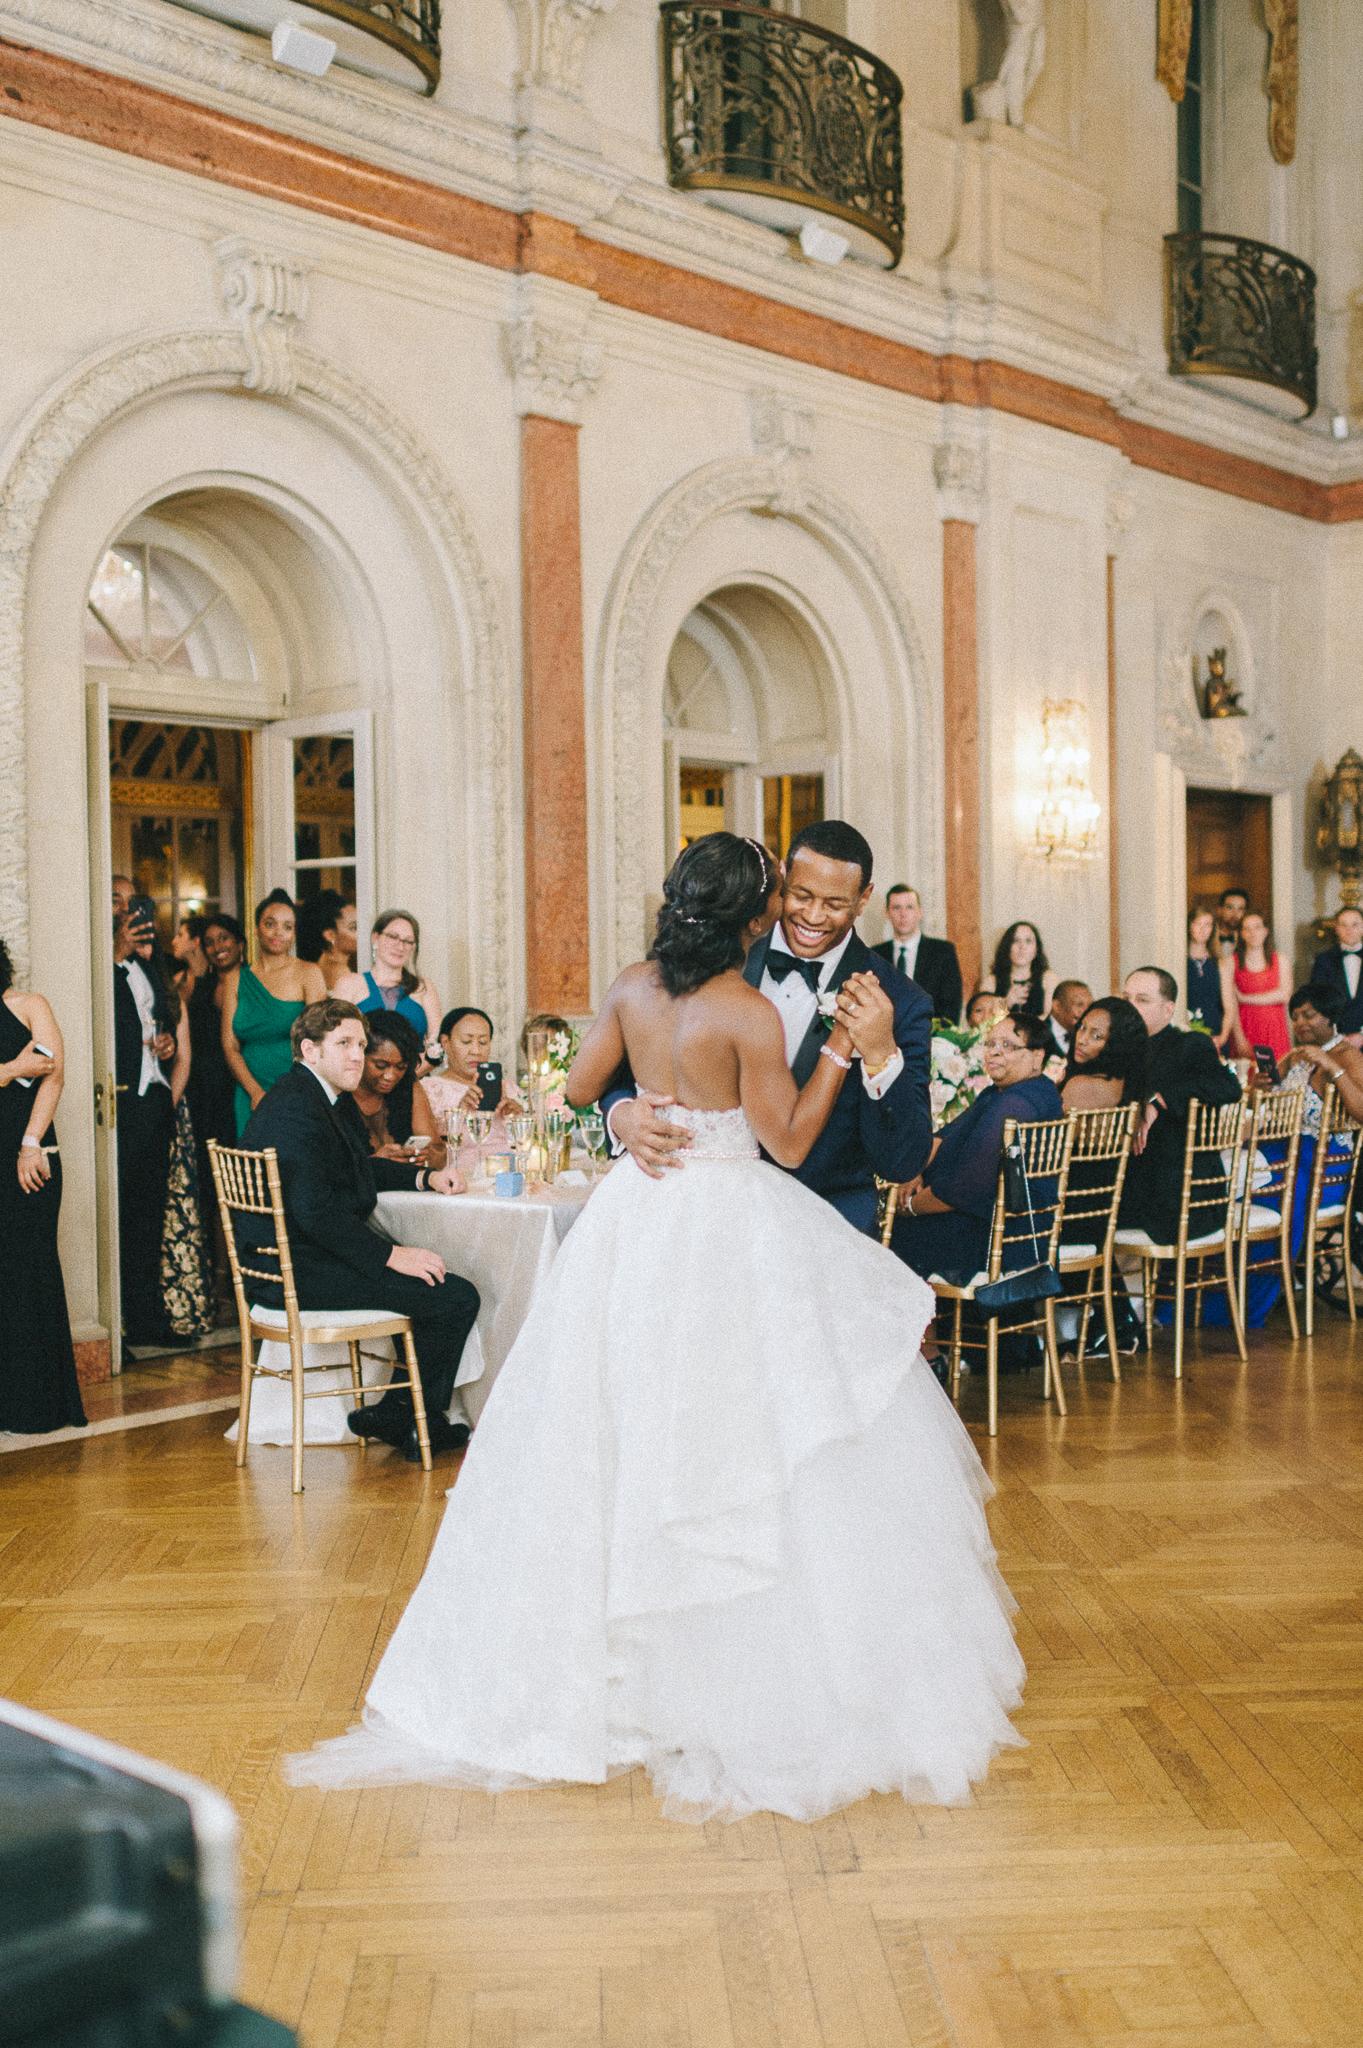 abby marcus wedding firstdance 228